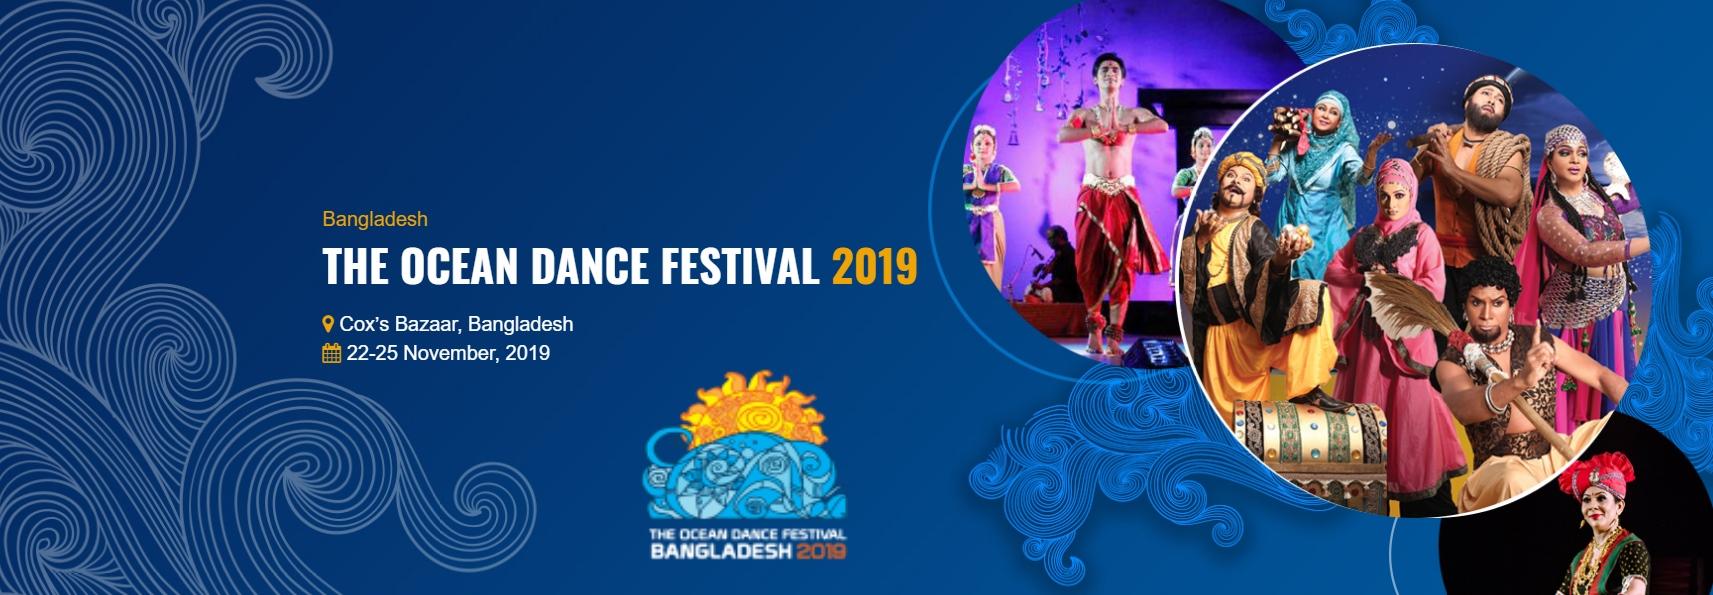 bangladesh_oceandancefestival